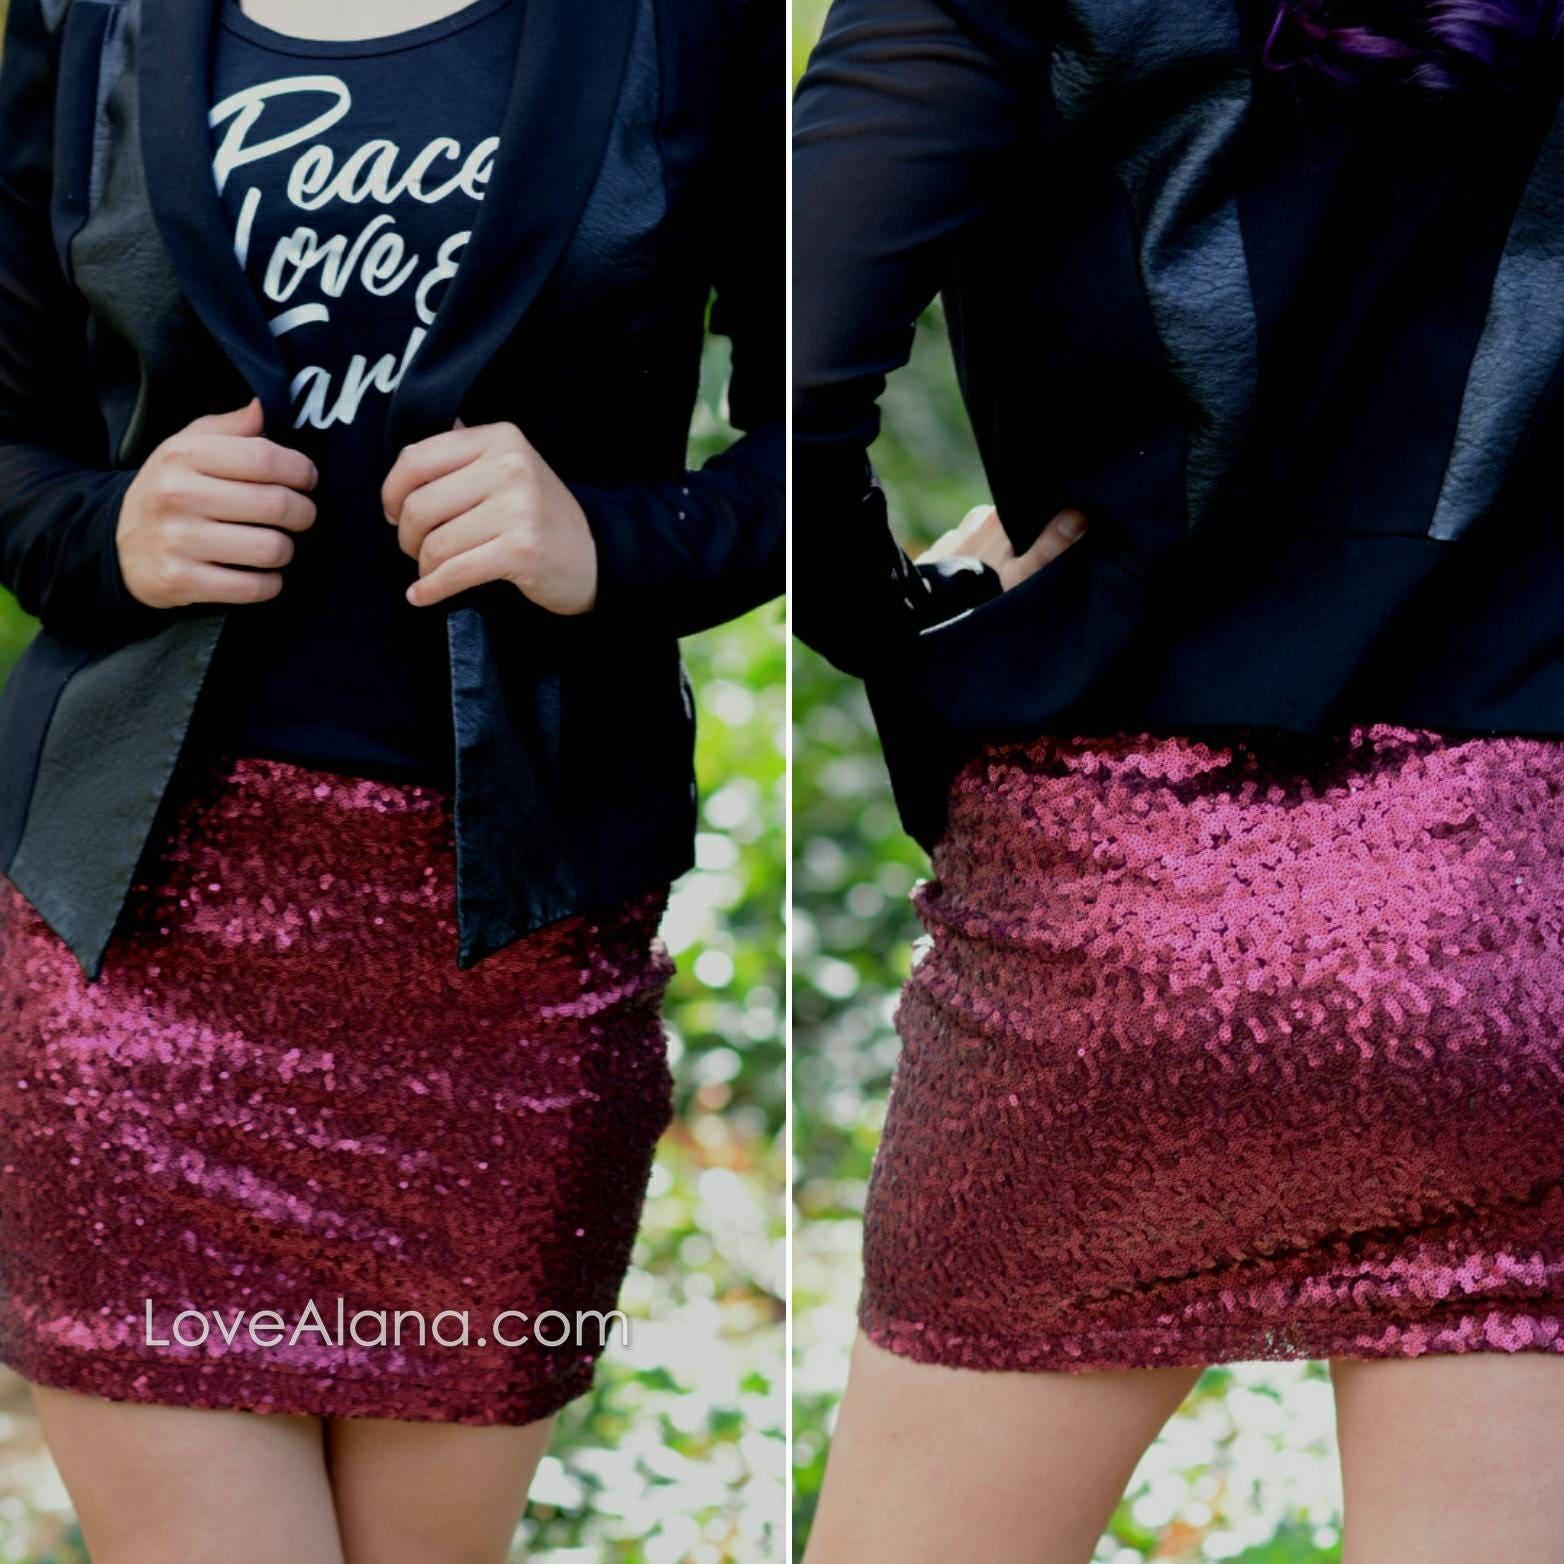 Forest Green Sequin Skirt Stretchy Small, Medium, Large, XLarge fun mini skirt beautiful Ships asap! Runs snug